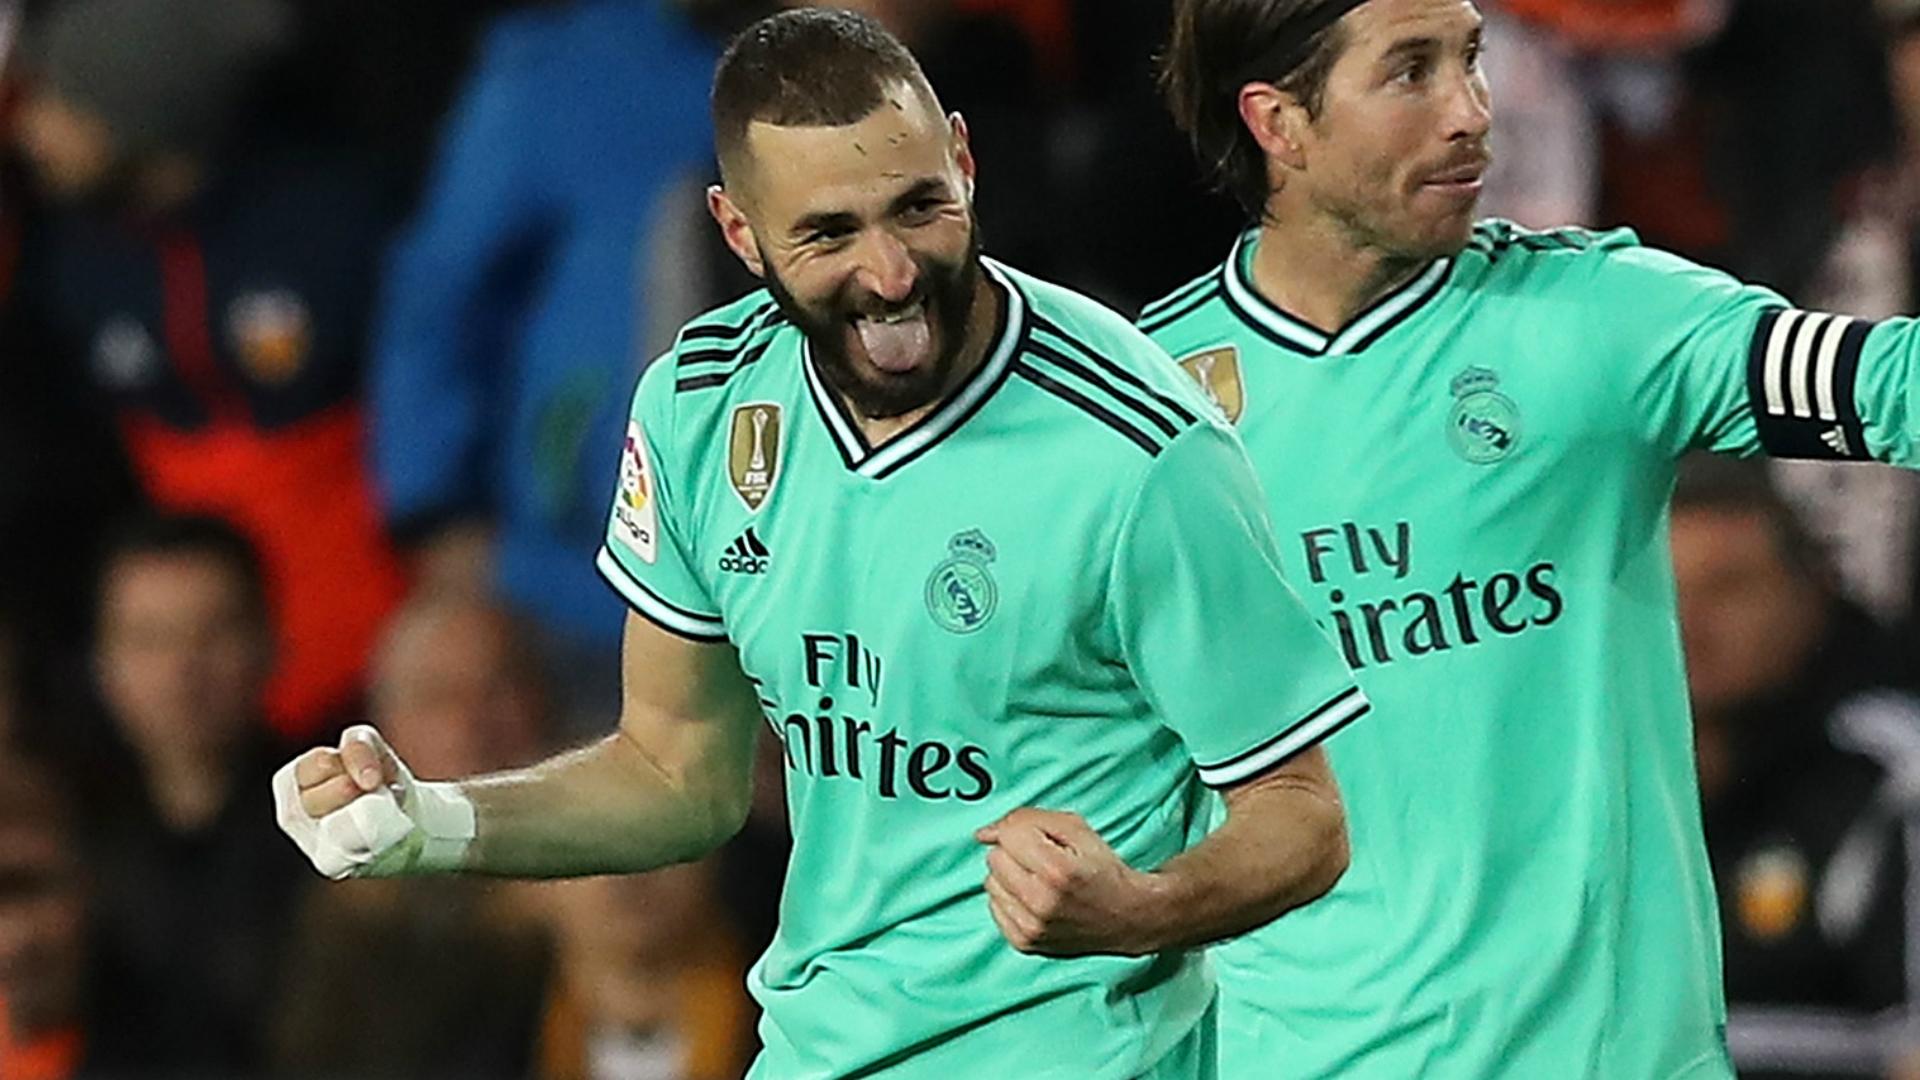 Rumour Has It: Benzema to sign Madrid deal as Man Utd eye Calvert-Lewin & Arsenal star nears exit